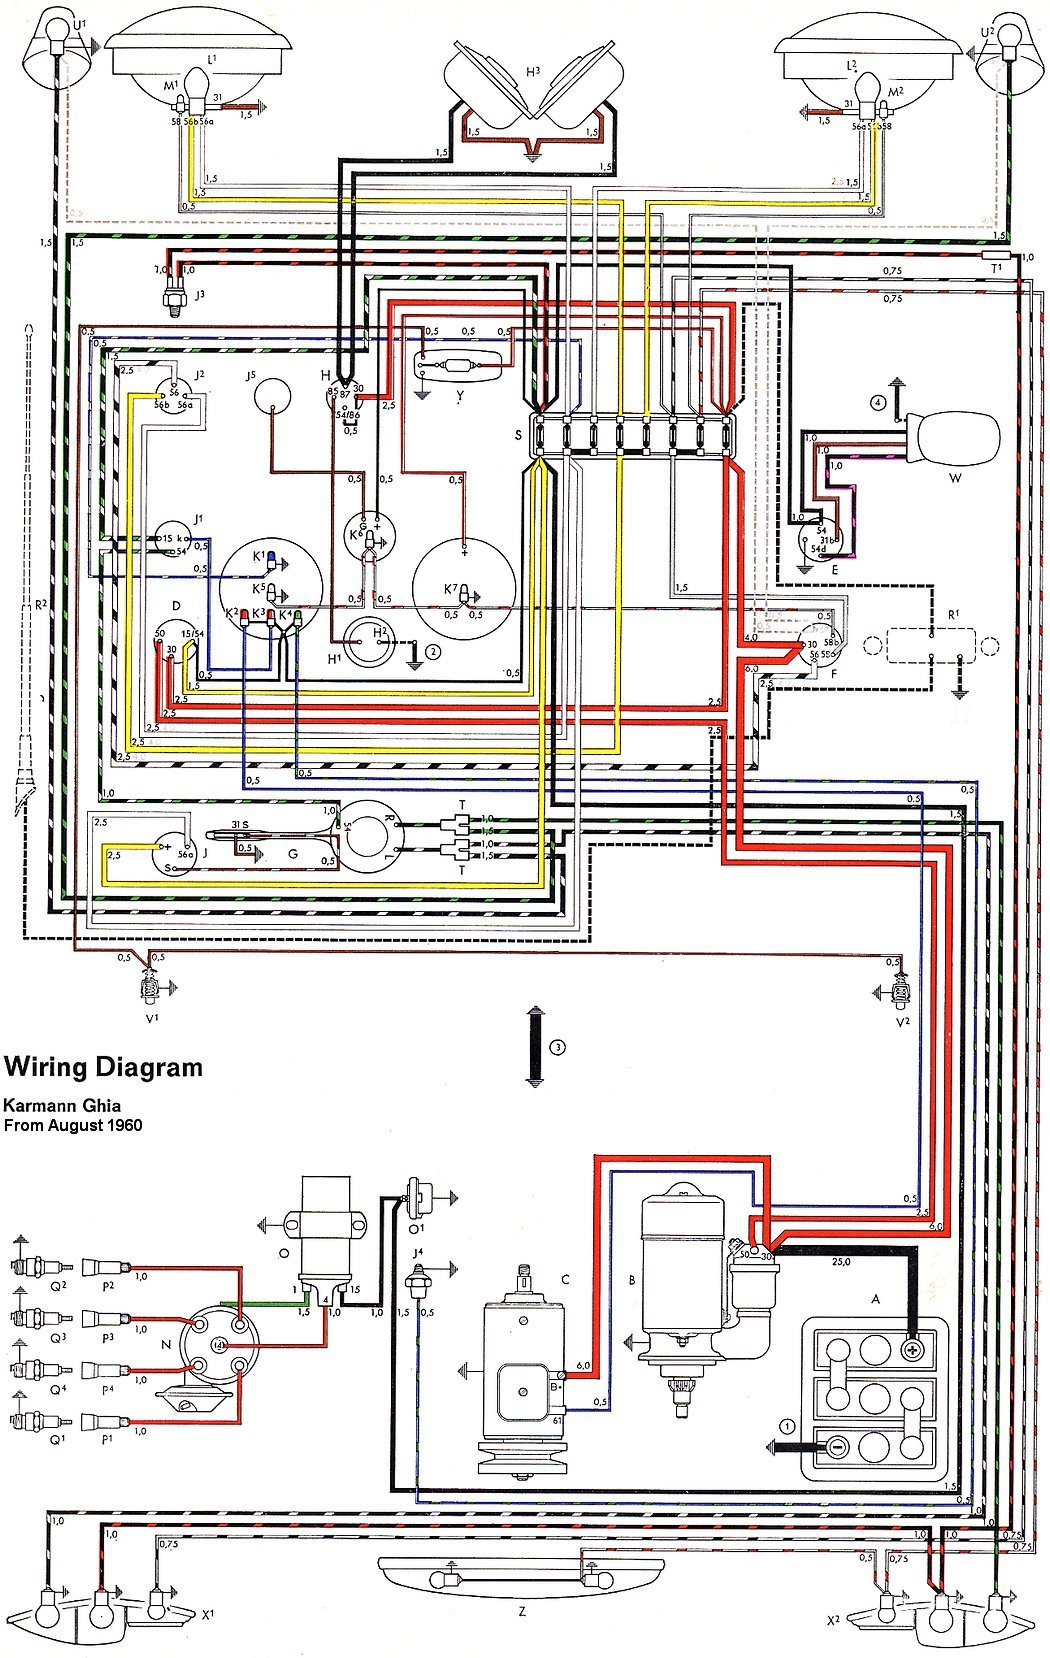 1972 Vw Beetle Wiring Harness Diagram – Karmann Ghias For Wiring Diagrams